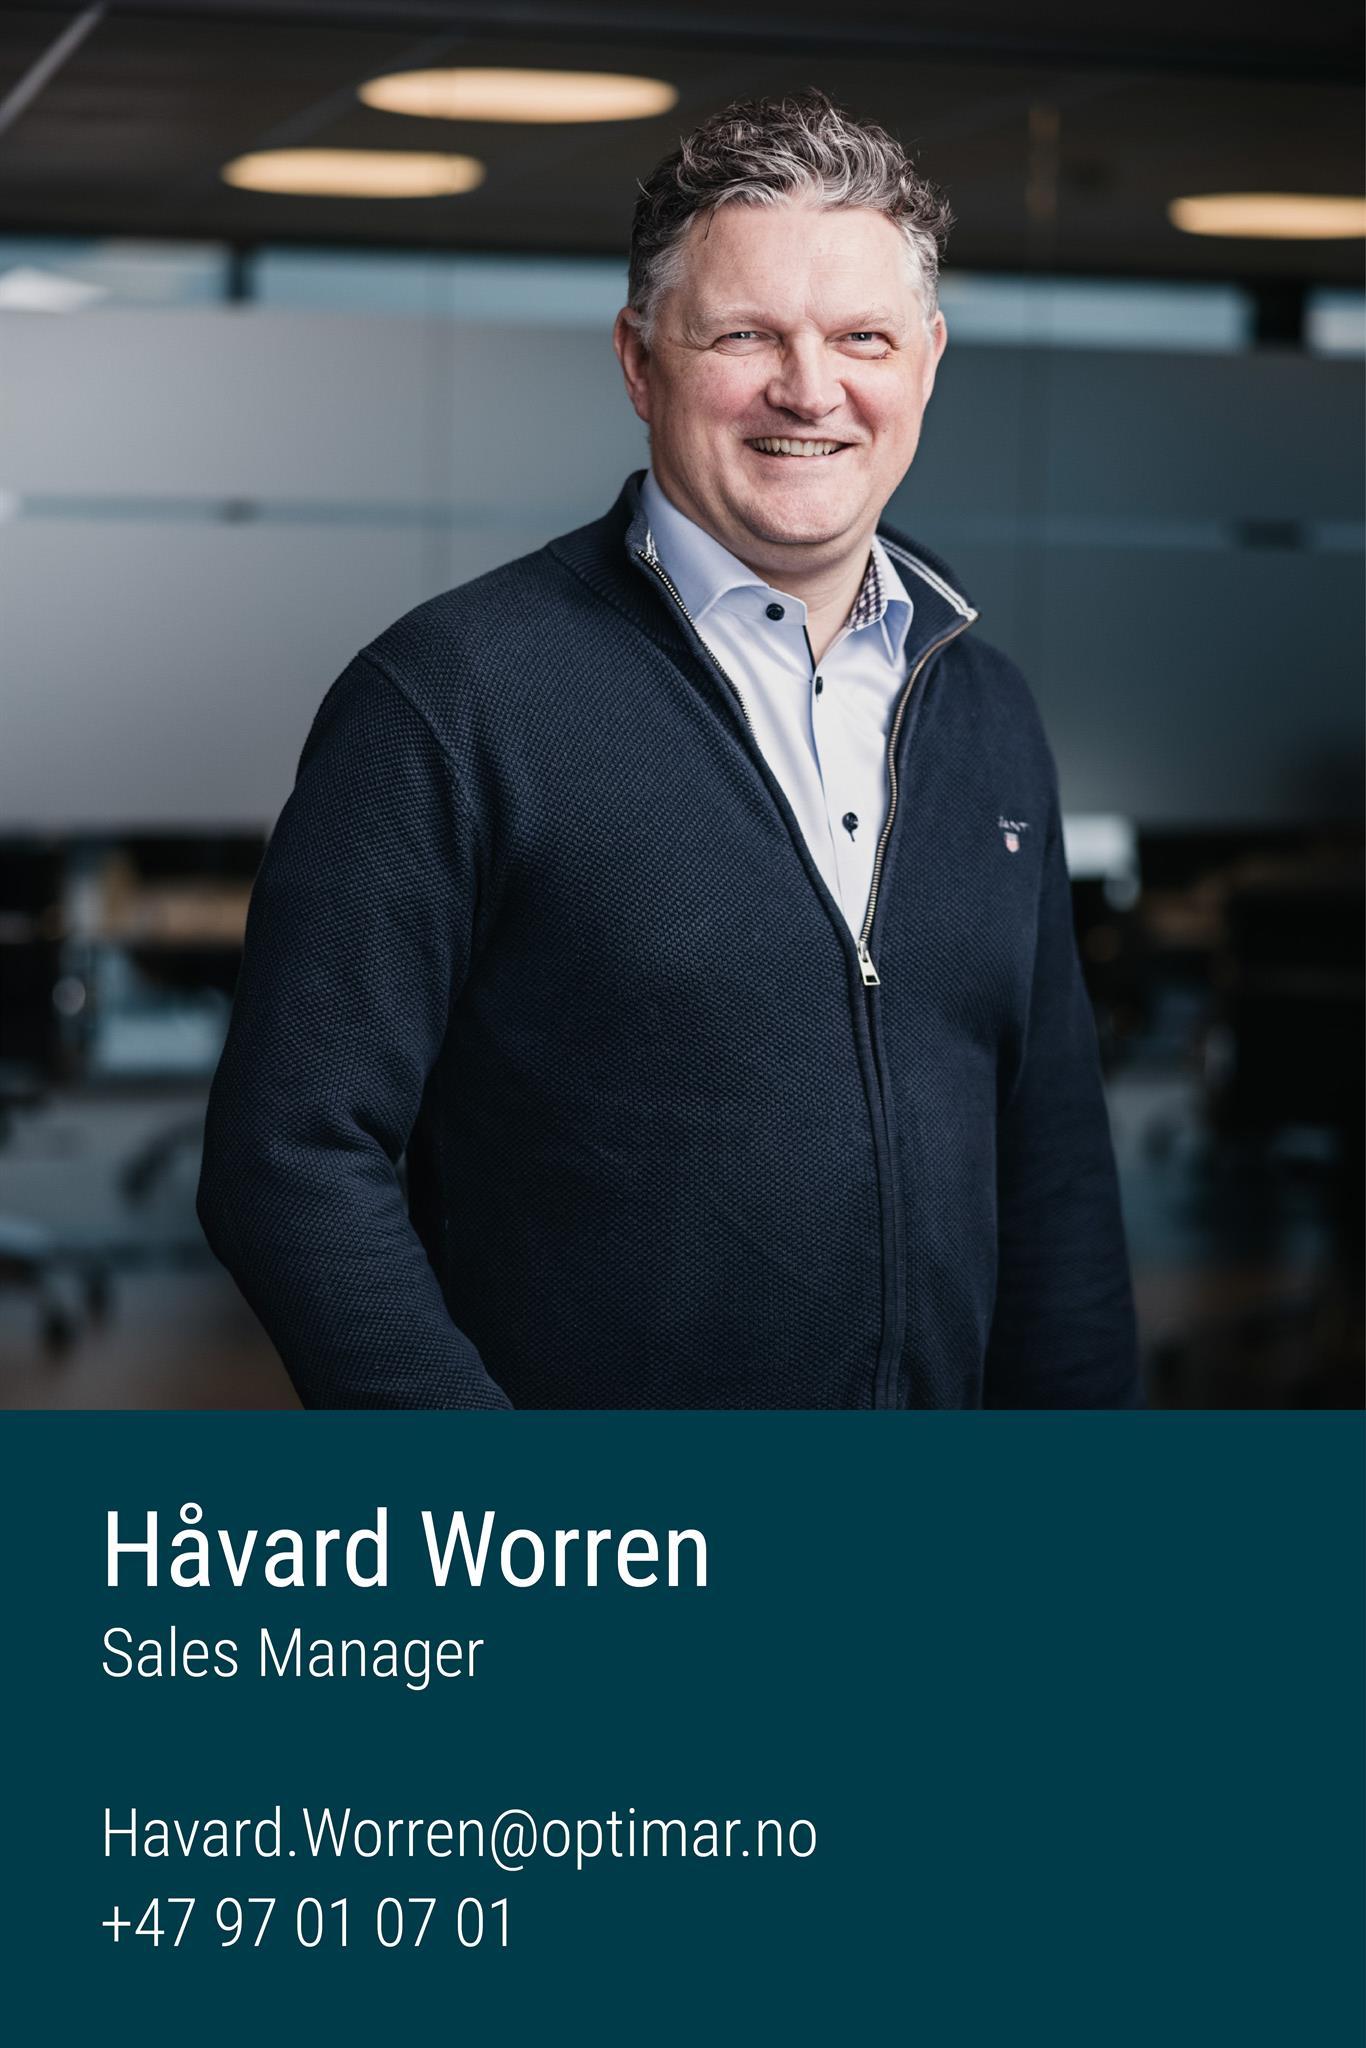 Håvard Worren